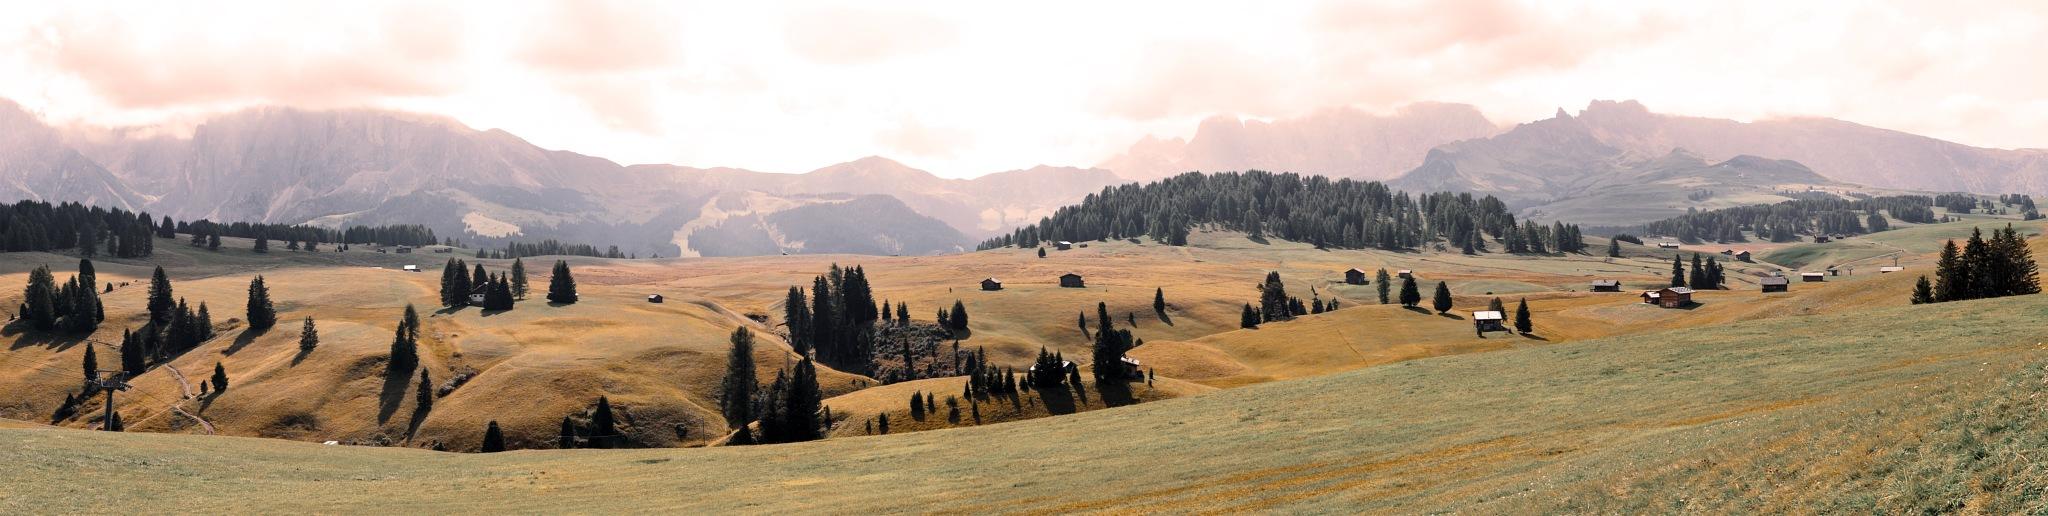 grassland  SEISERALM by maurizio senoner